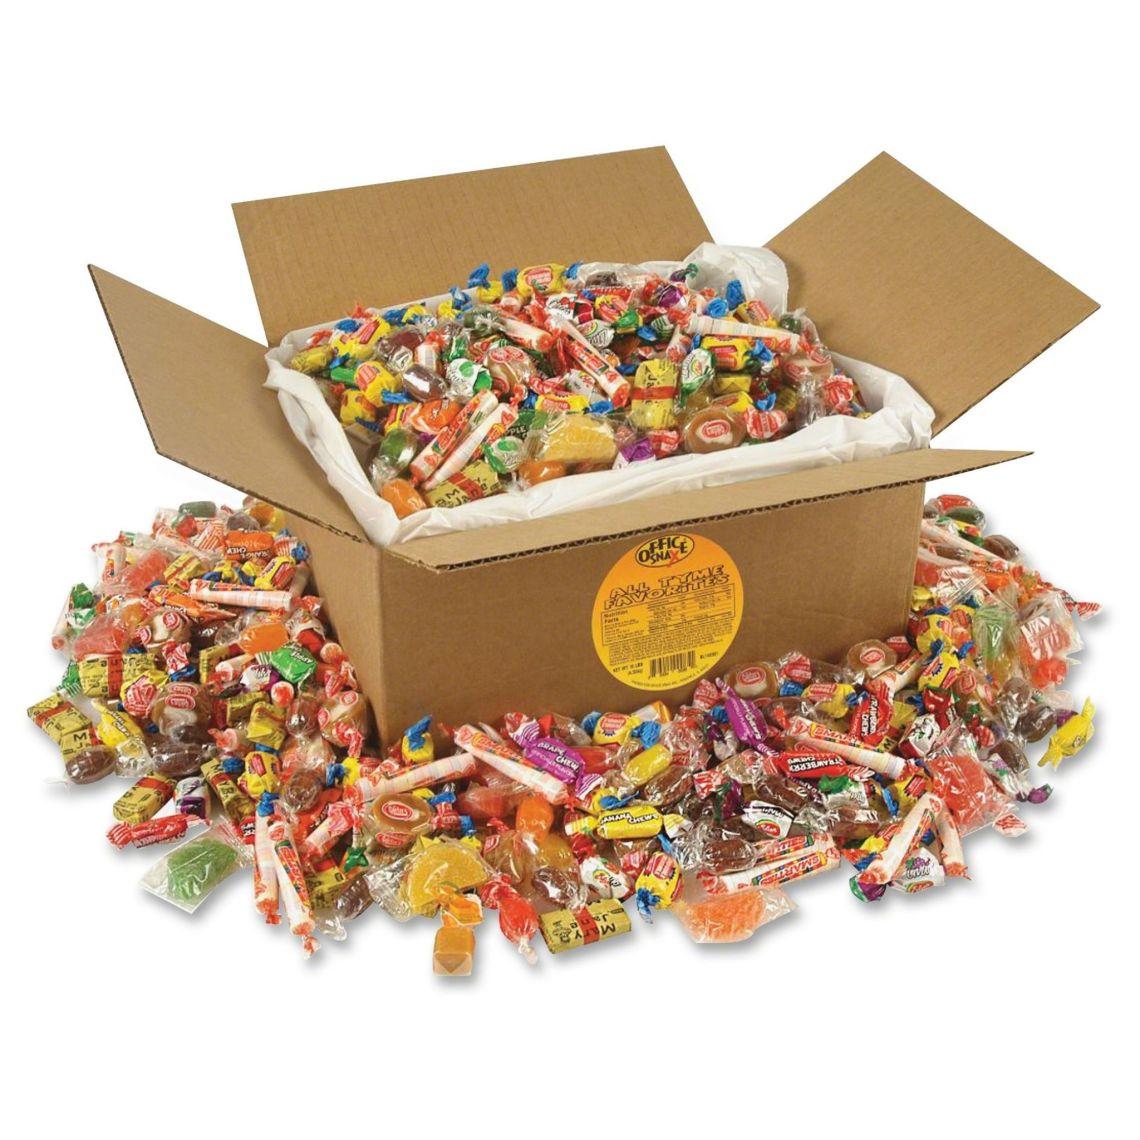 Office Snax All Tyme Favorites Candy Mix, 10 lb Box - Walmart.com